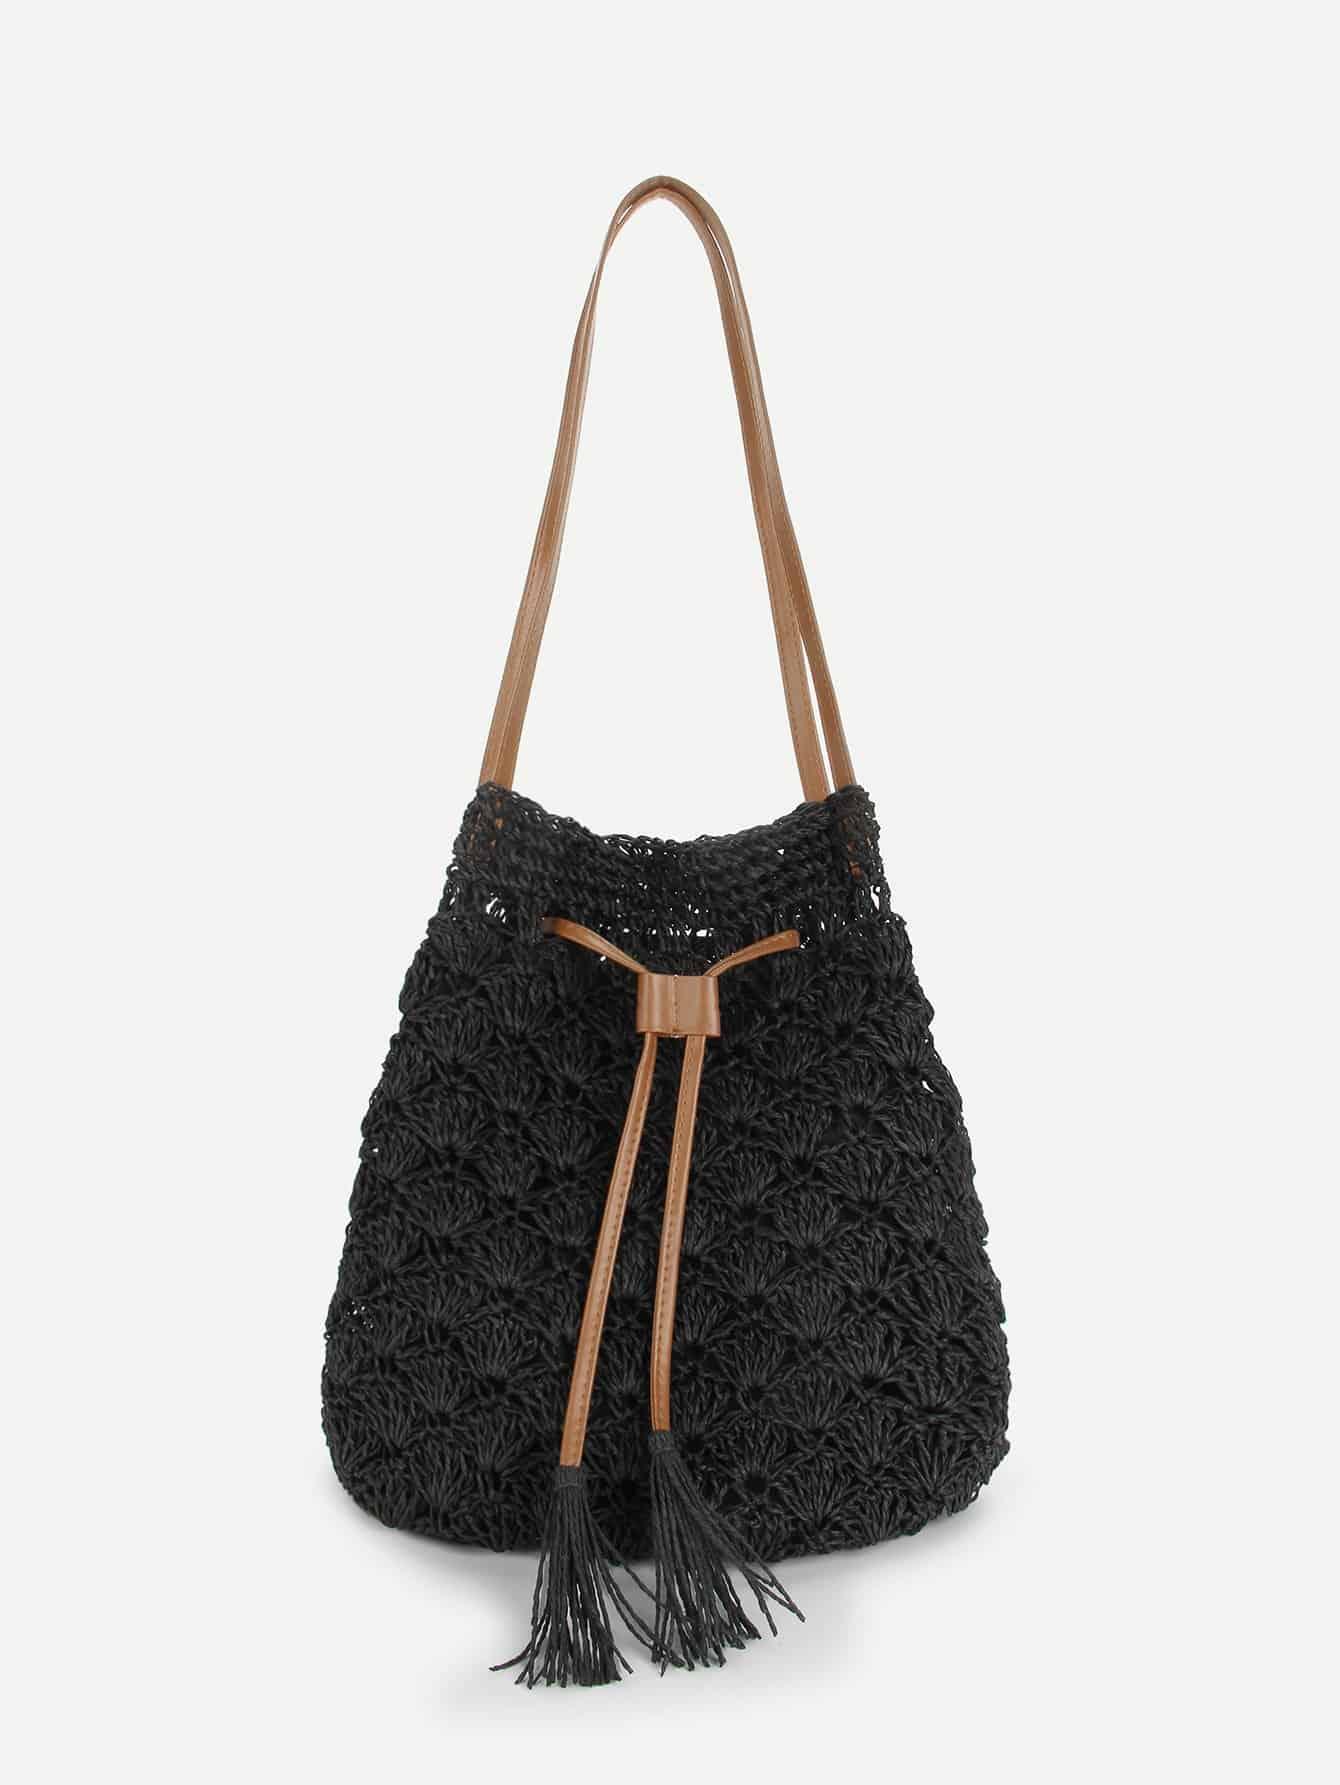 Tassel Drawstring Tote Bag